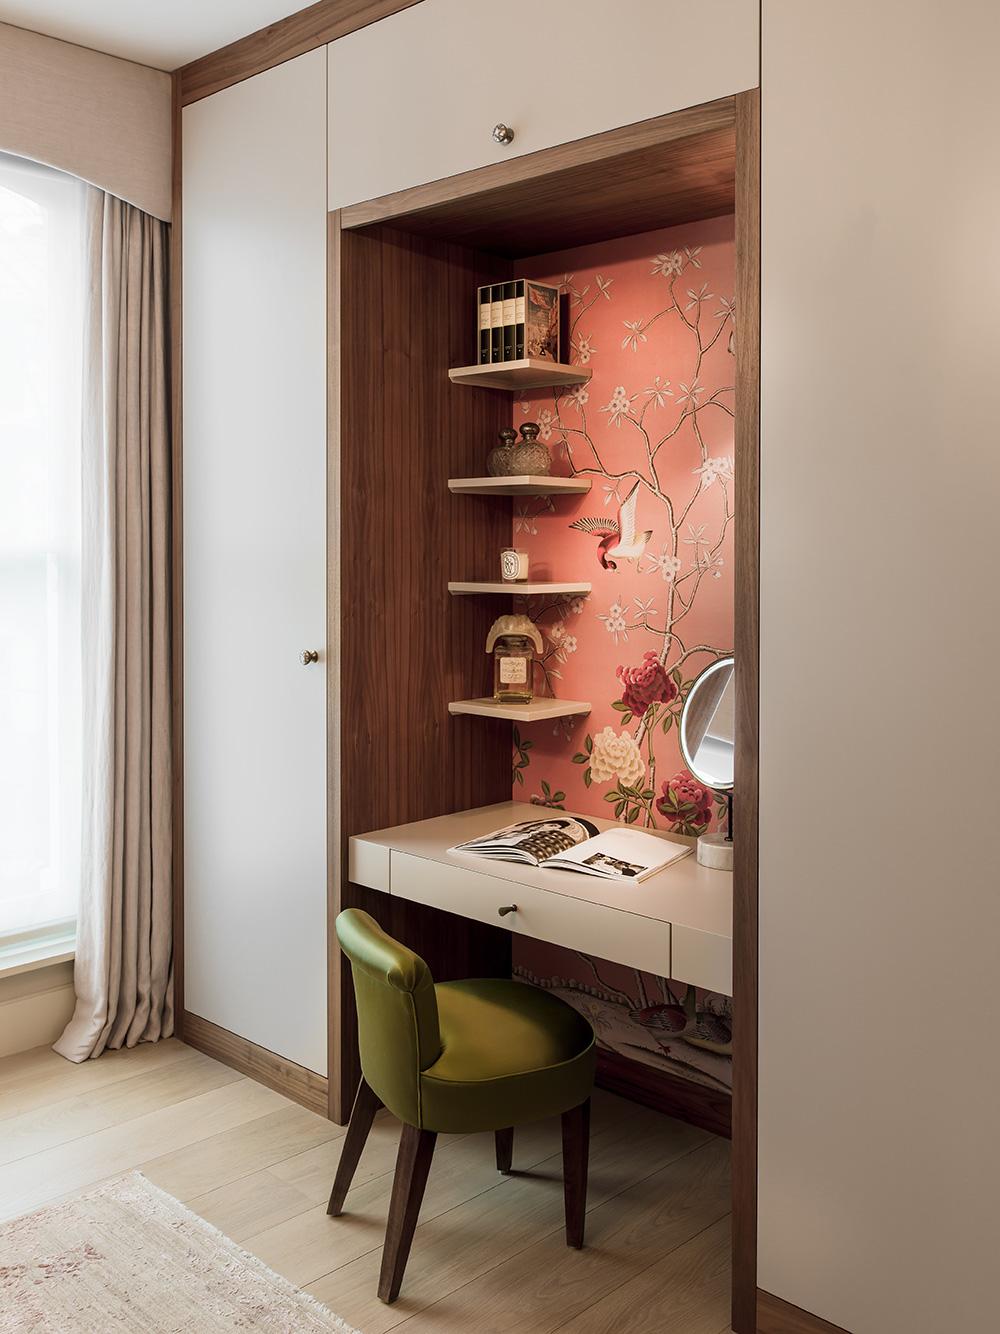 Inset desk – interior design by Eadie & Crole